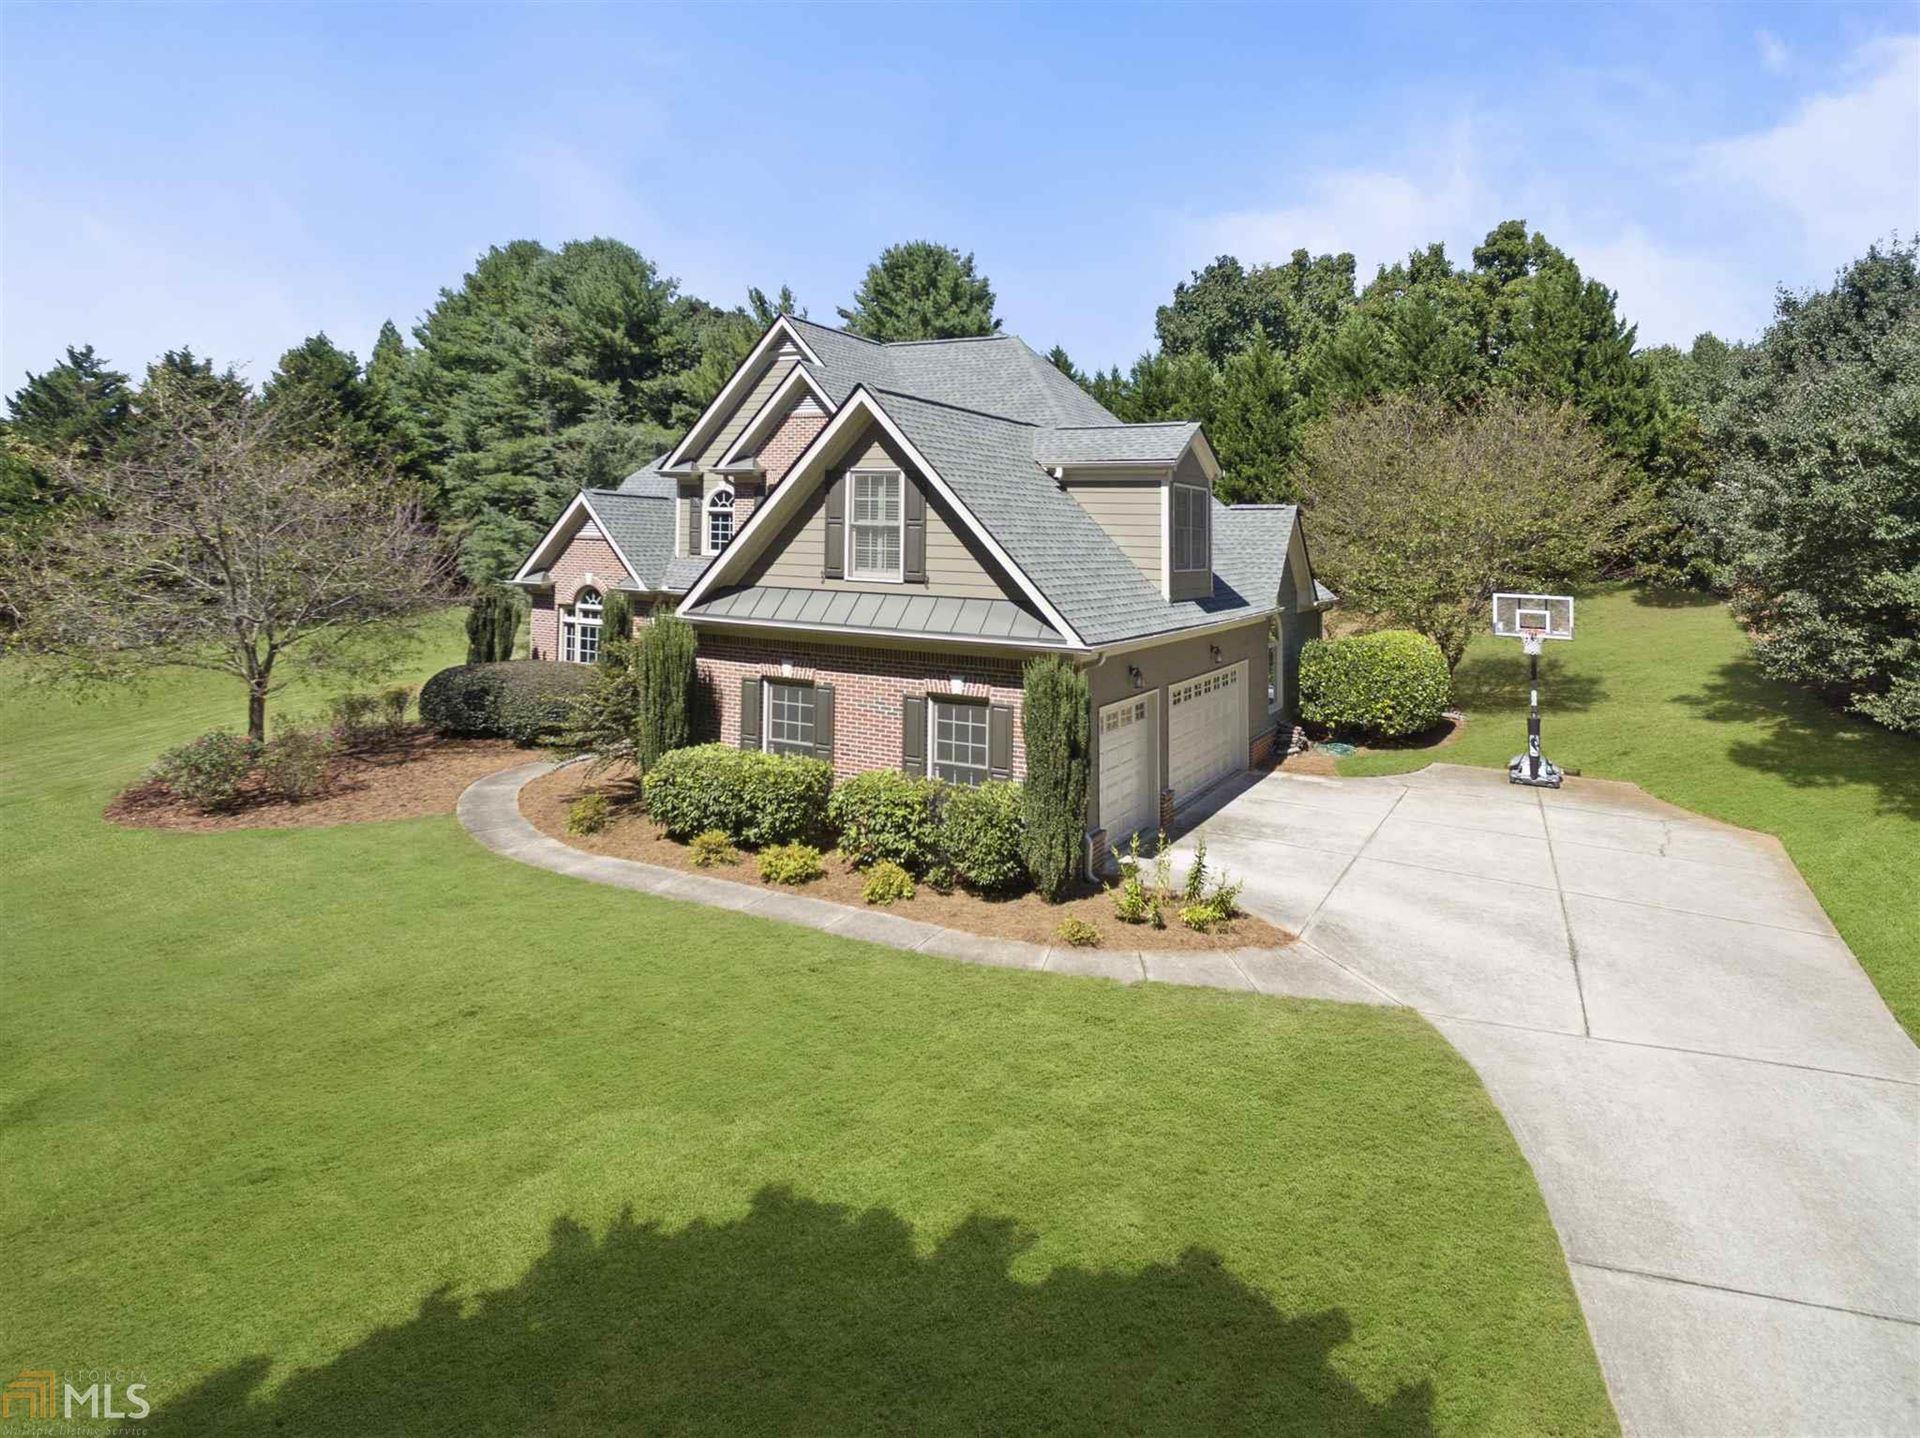 4207 Willow Oak Dr, Gainesville, GA 30506 - #: 8864327